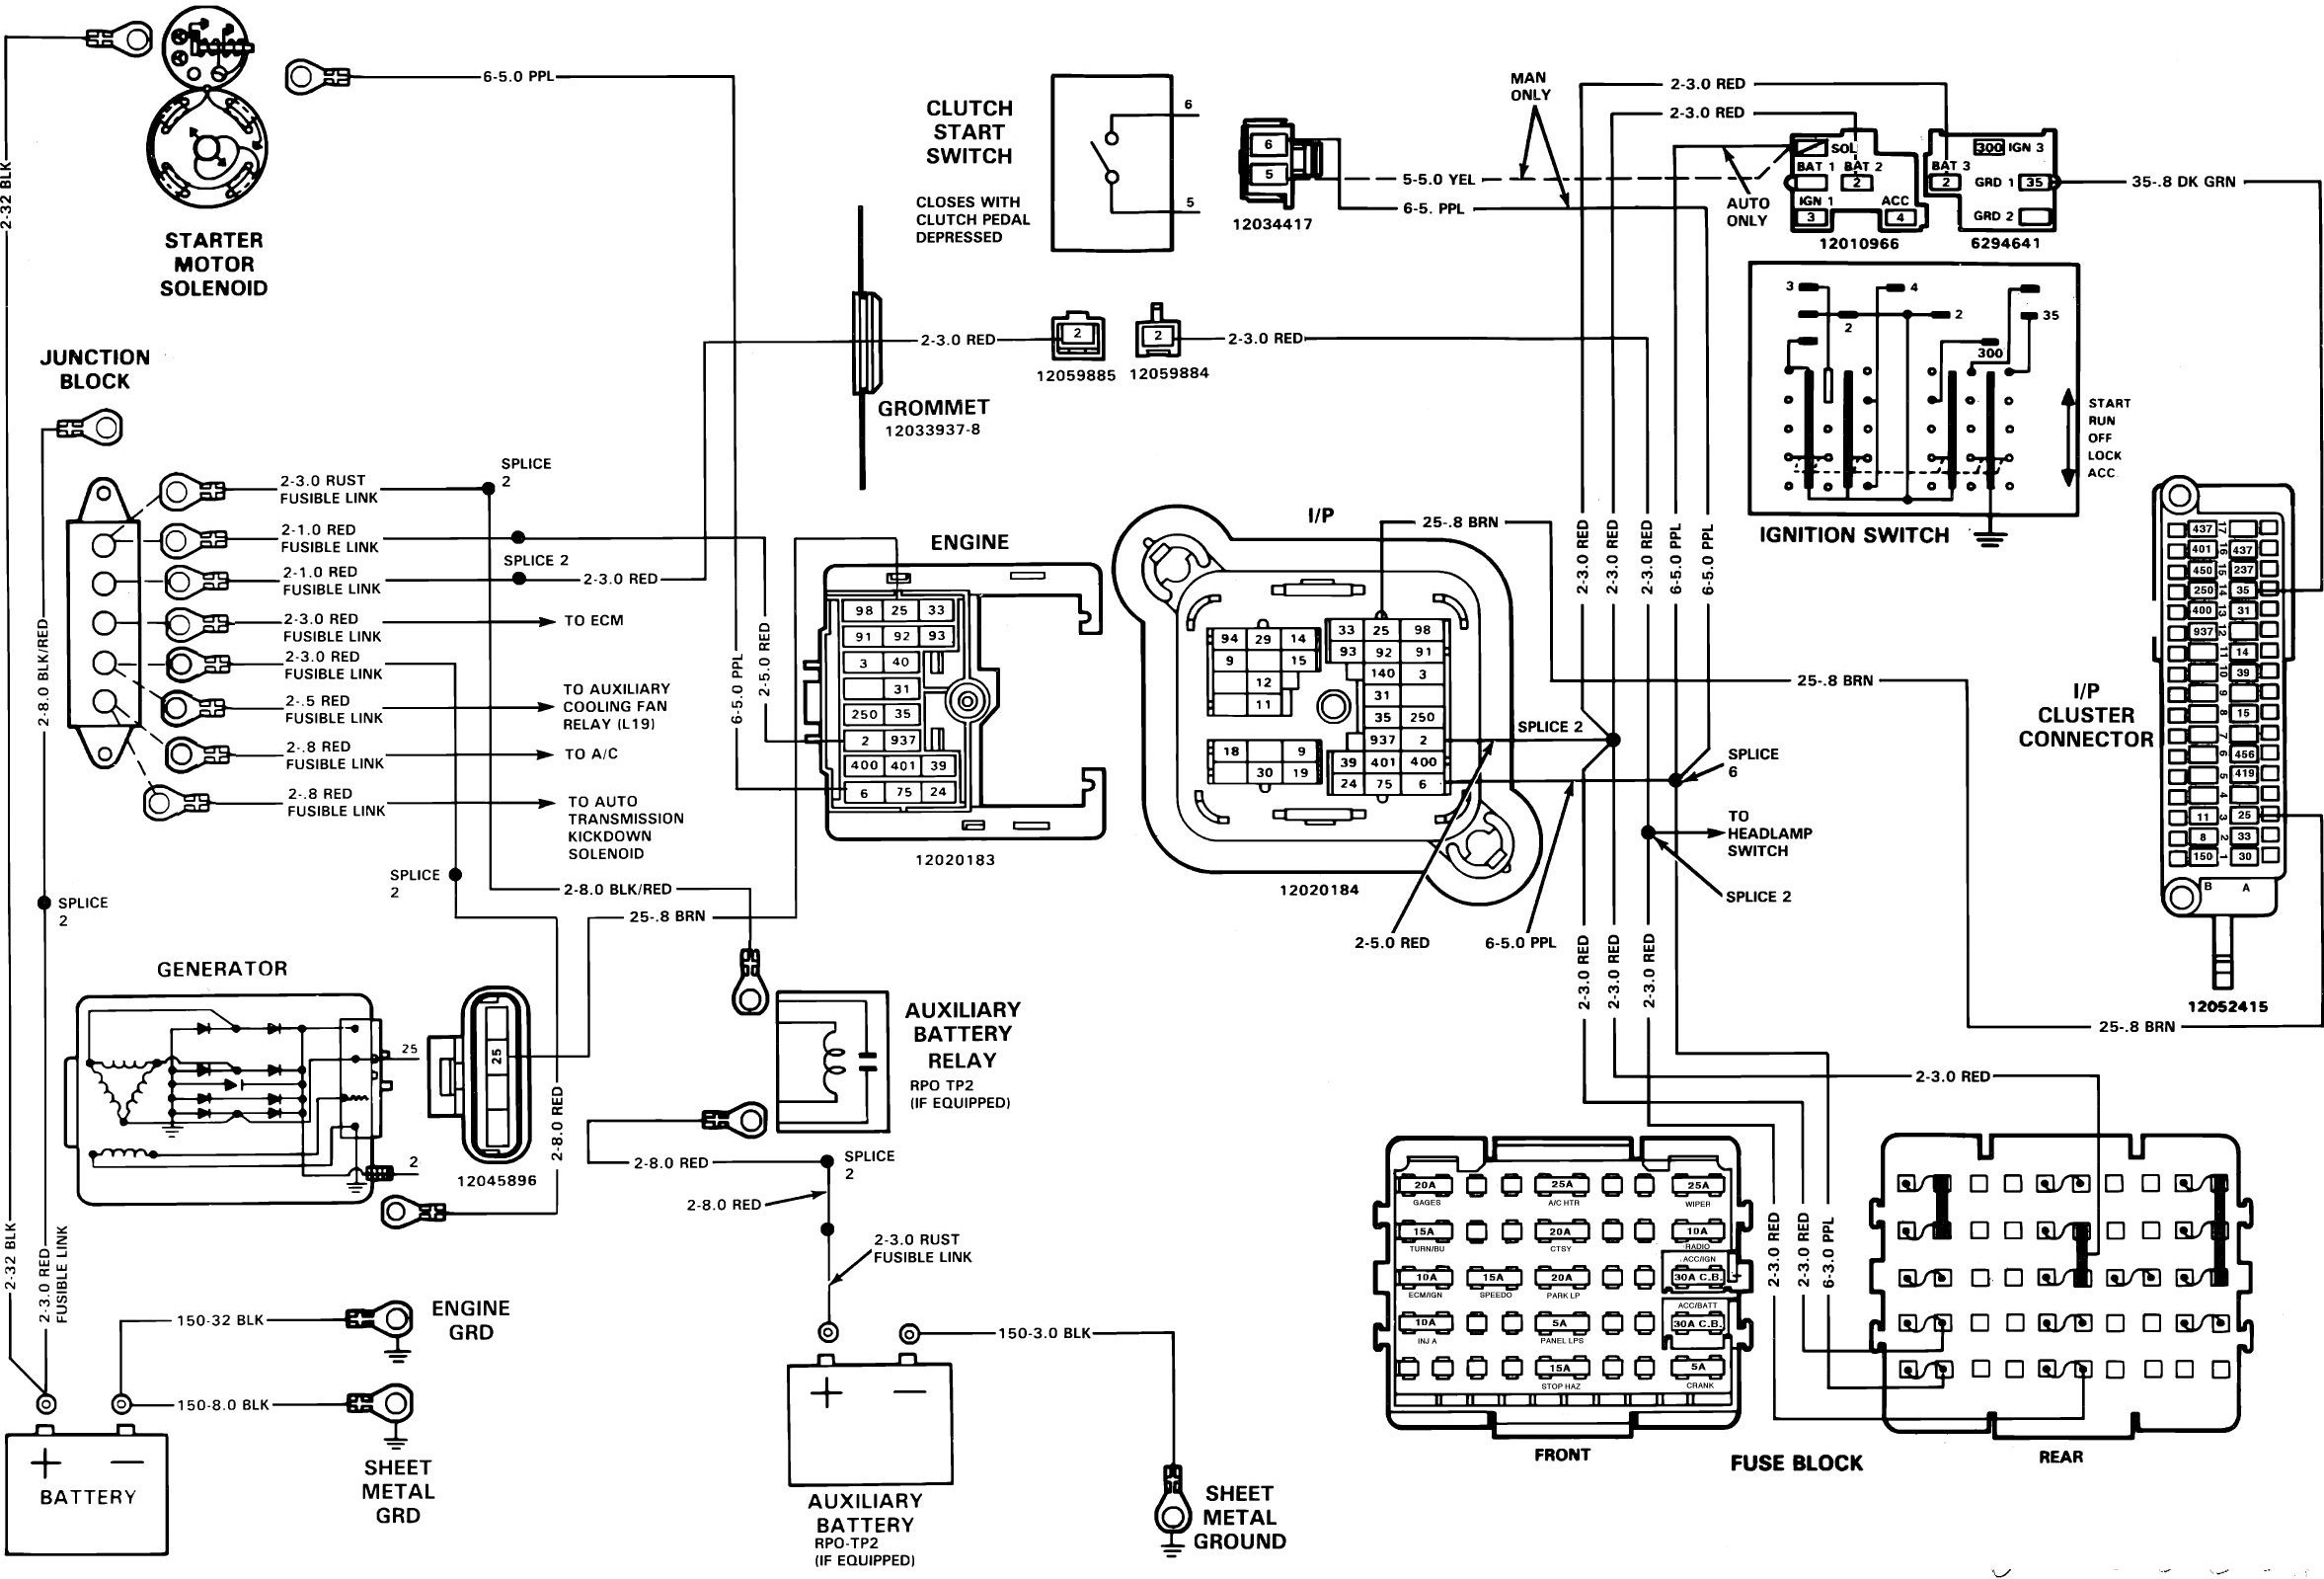 Engine Wiring Diagrams 1989 Chevrolet C1500 Wiring Diagram 1989 Chevy 1500 Stereo Wiring Of Engine Wiring Diagrams